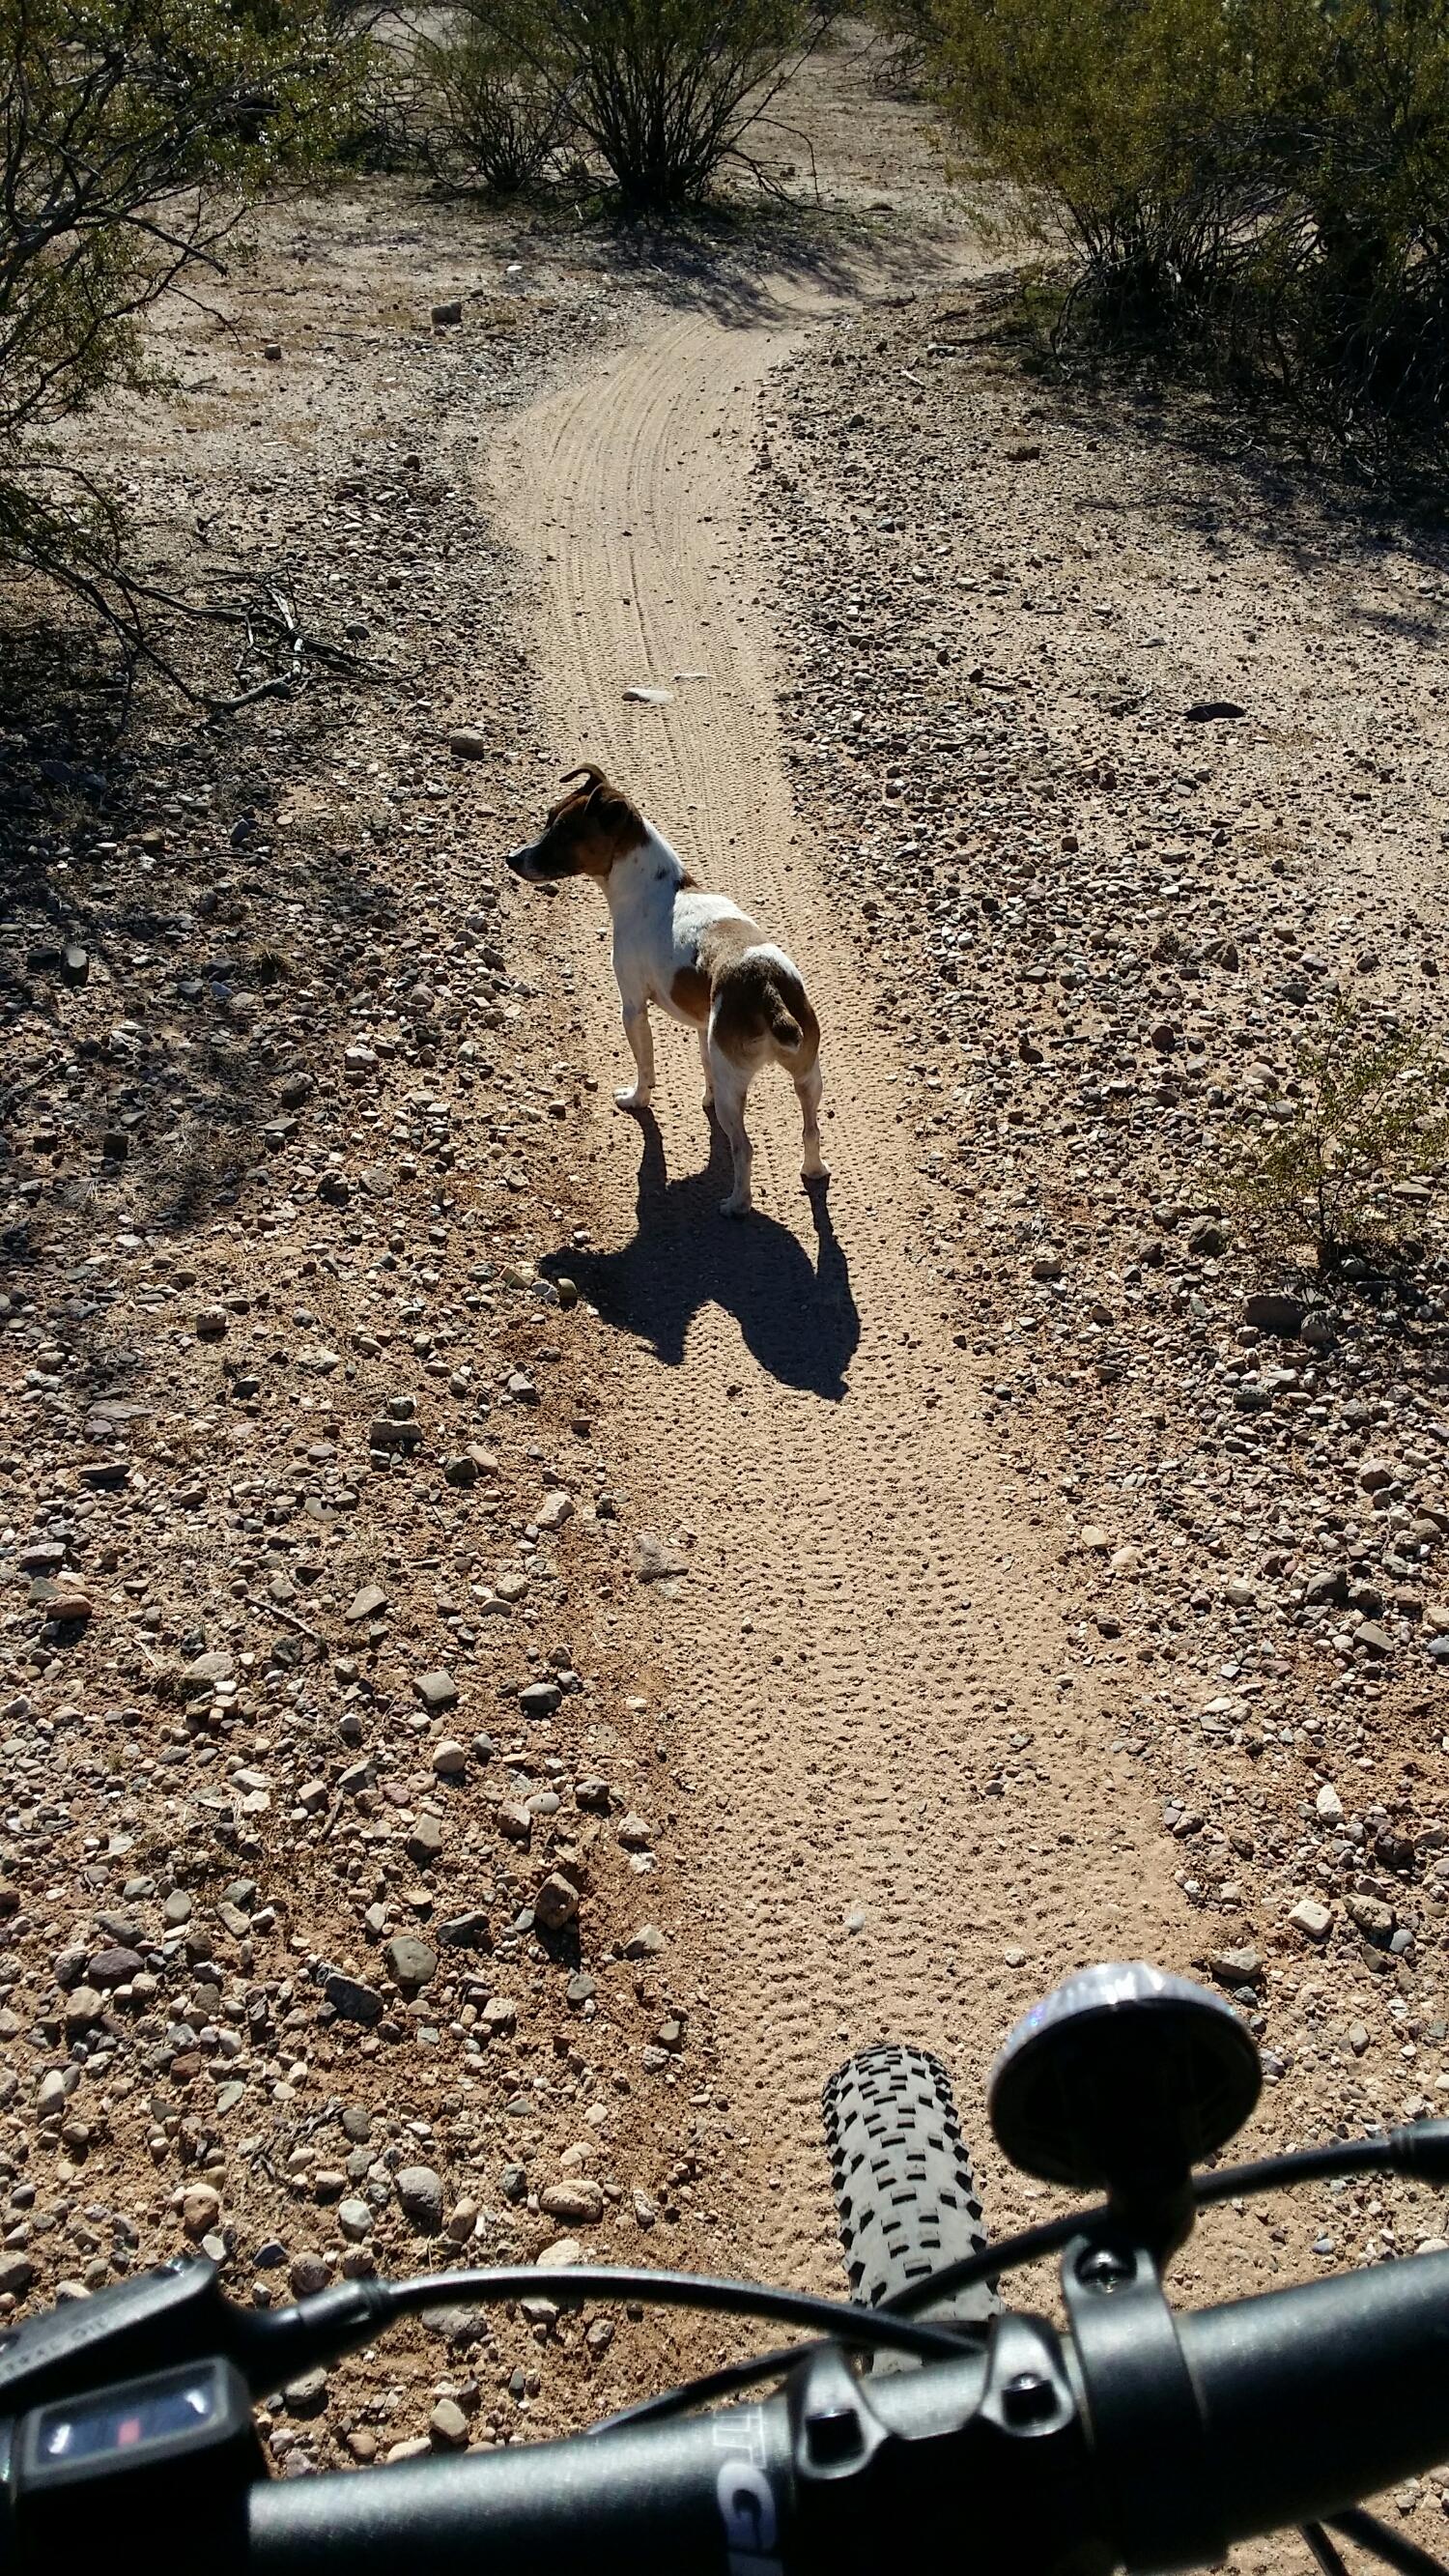 Milo, the Jack Russell Terrier, enjoying an off leash bike ride.